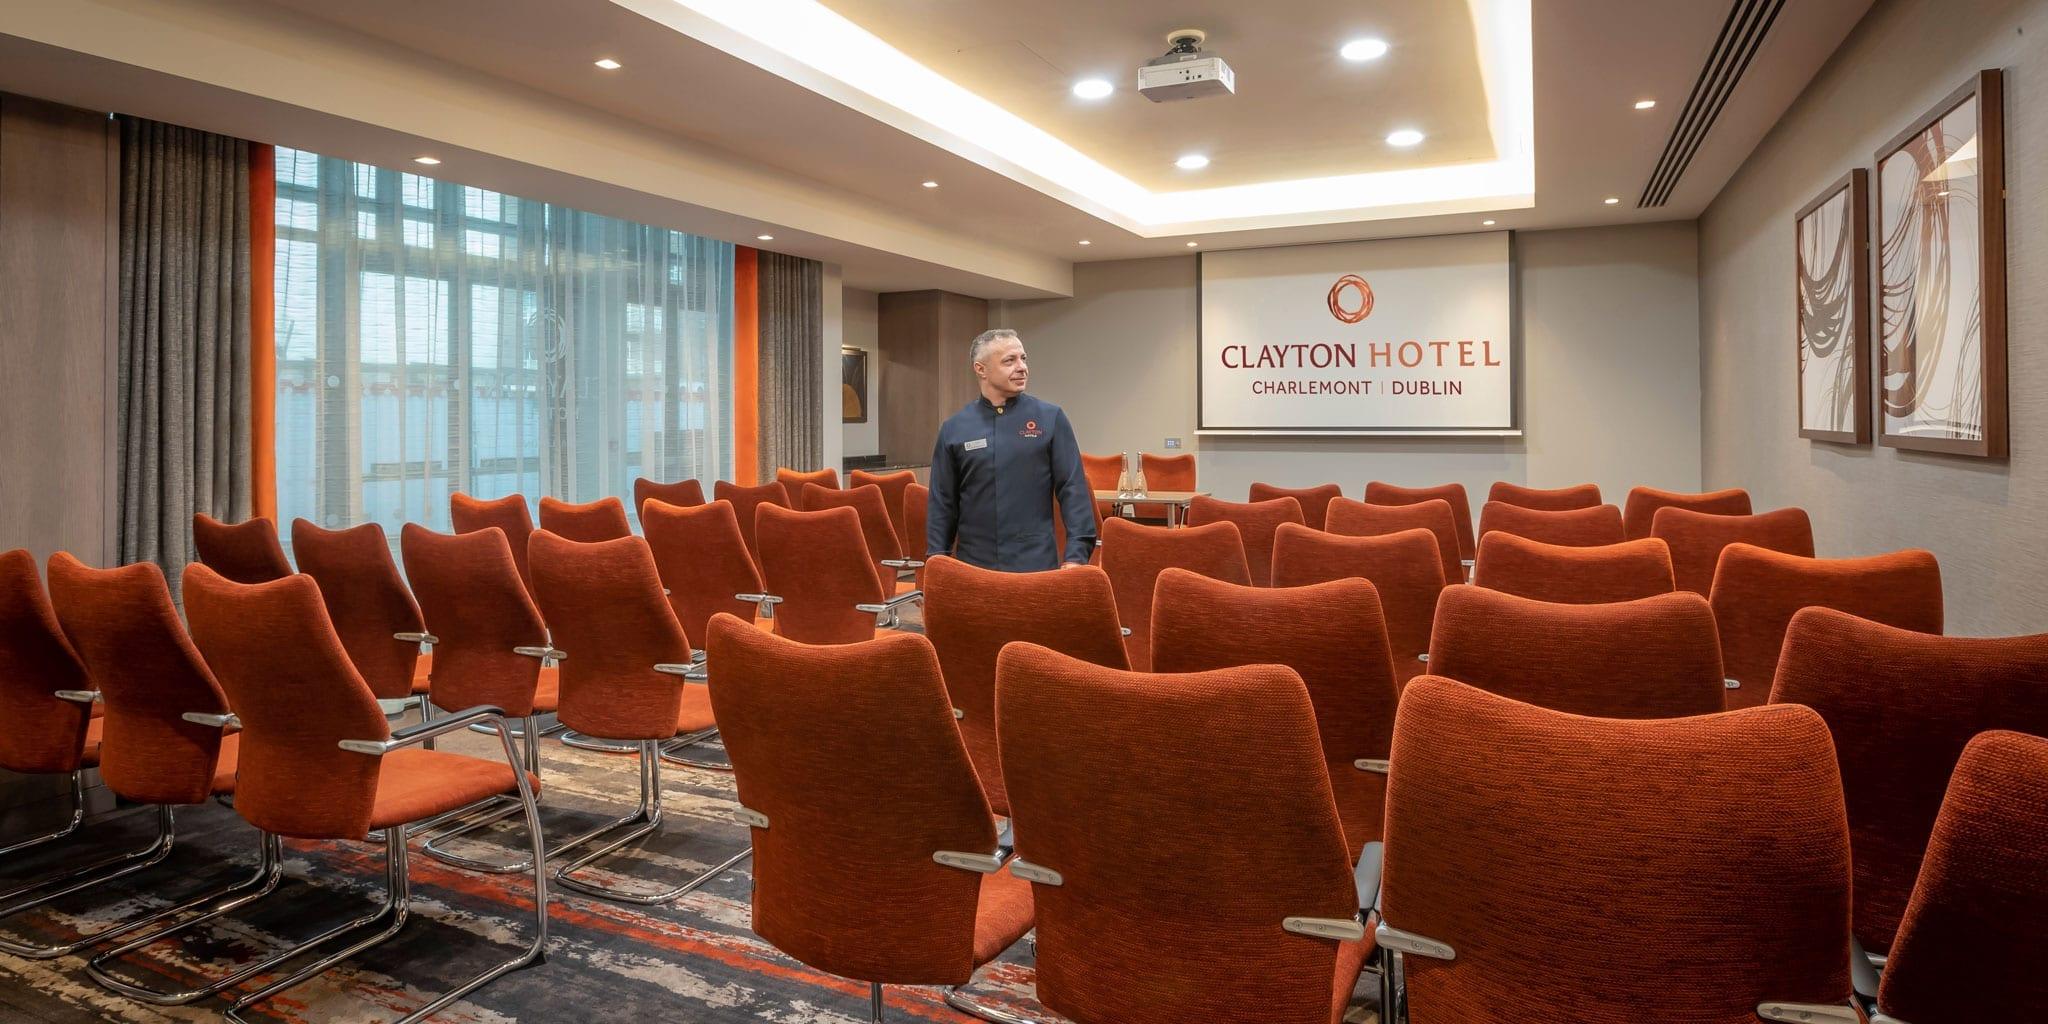 Conference room at Clayton Hotel Charlemont